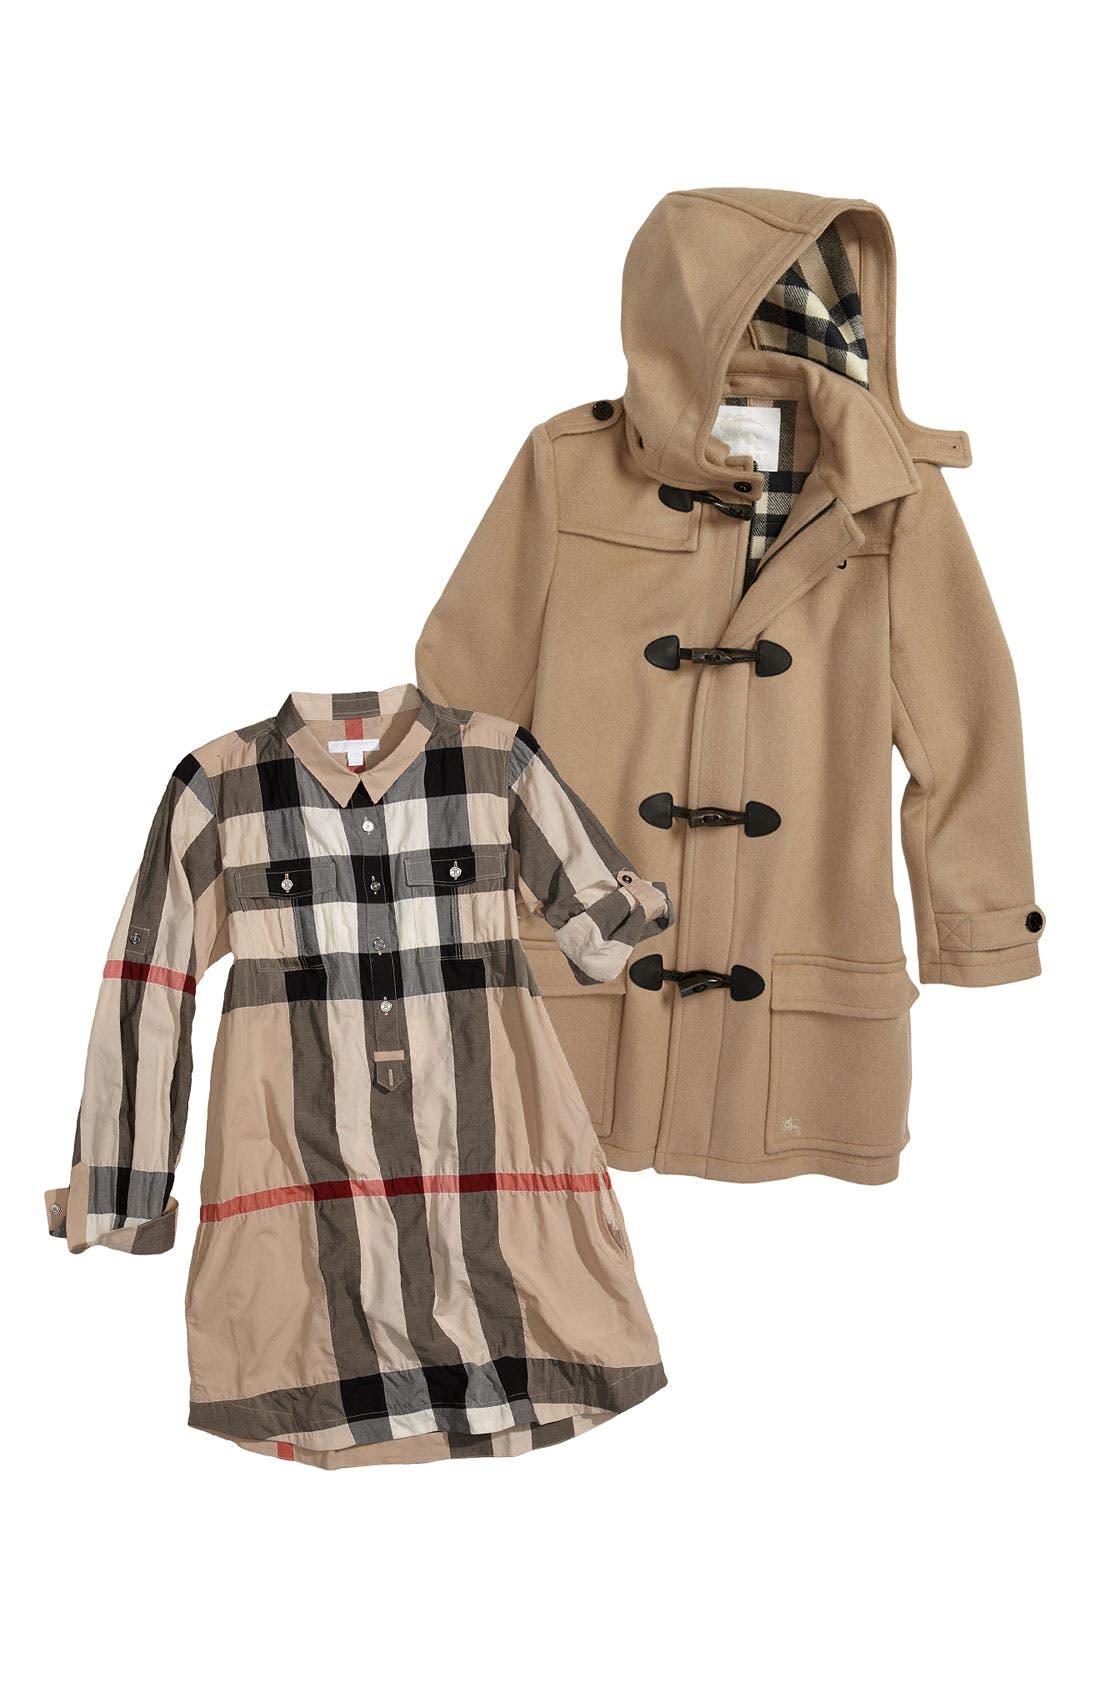 Main Image - Burberry Shirtdress & Coat (Big Girls)